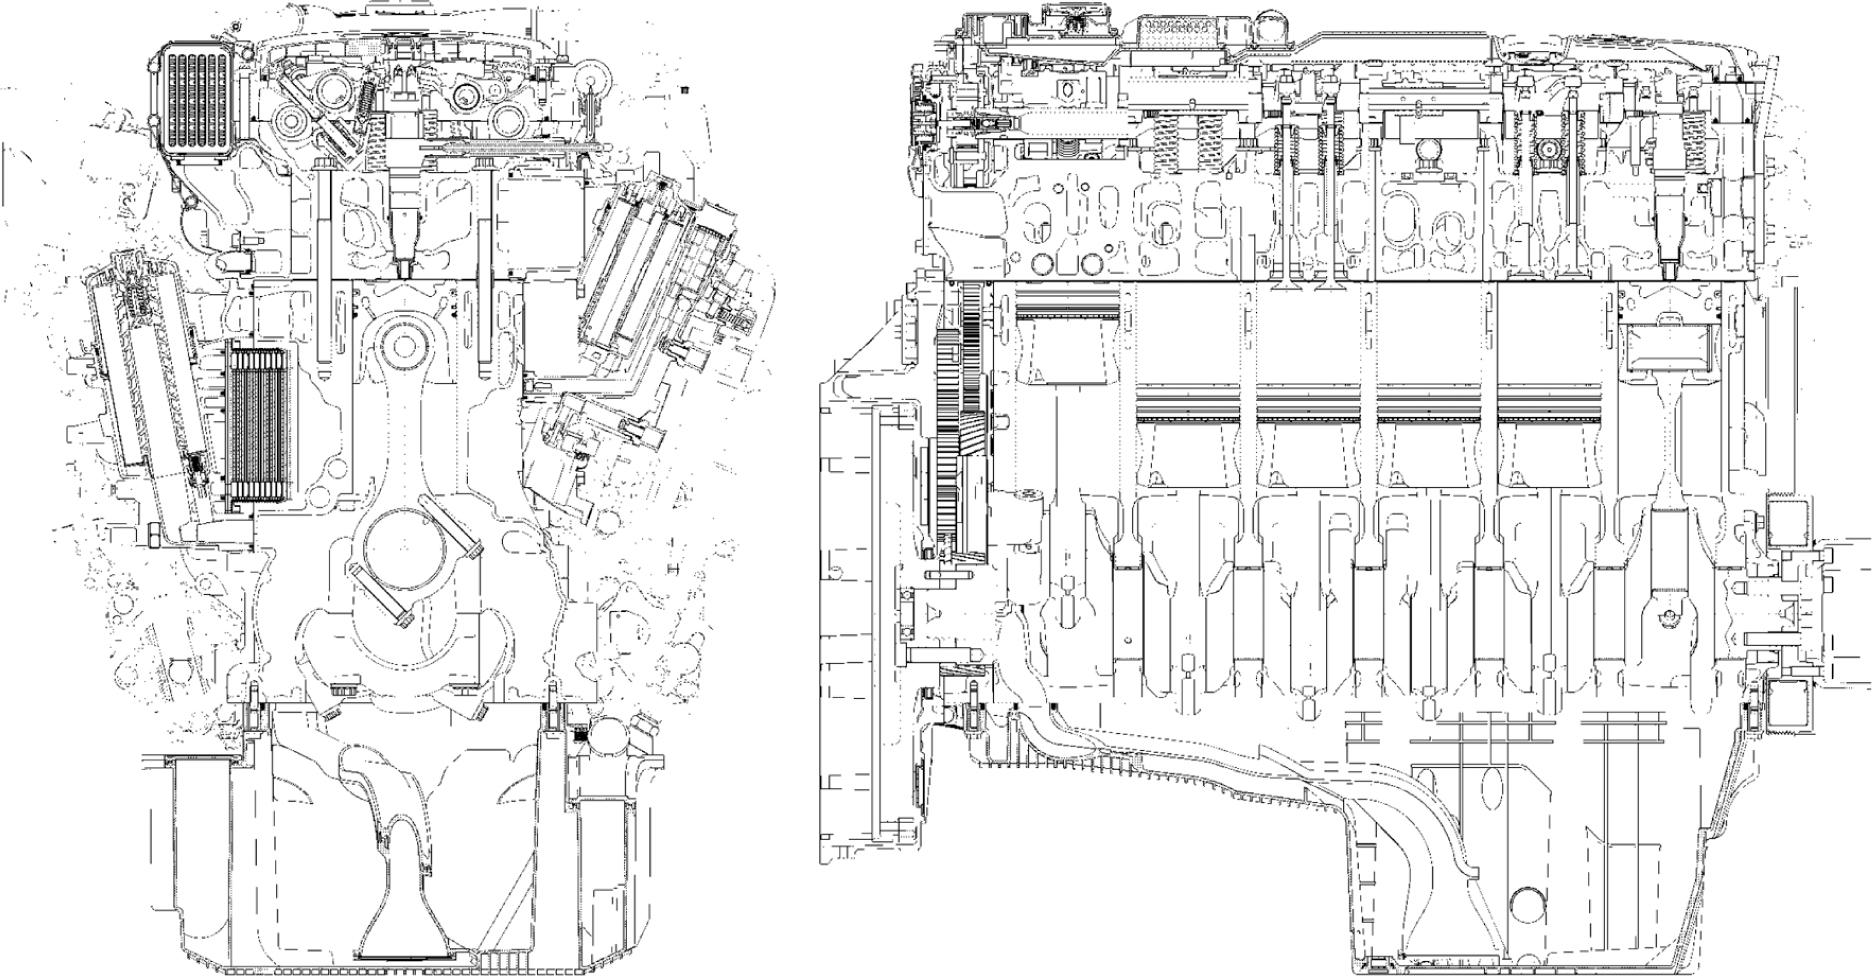 Mercedes Benz Medium Duty Commercial Engines Springerlink Mack Truck Engine Diagram Cylinder Head Open Image In New Window